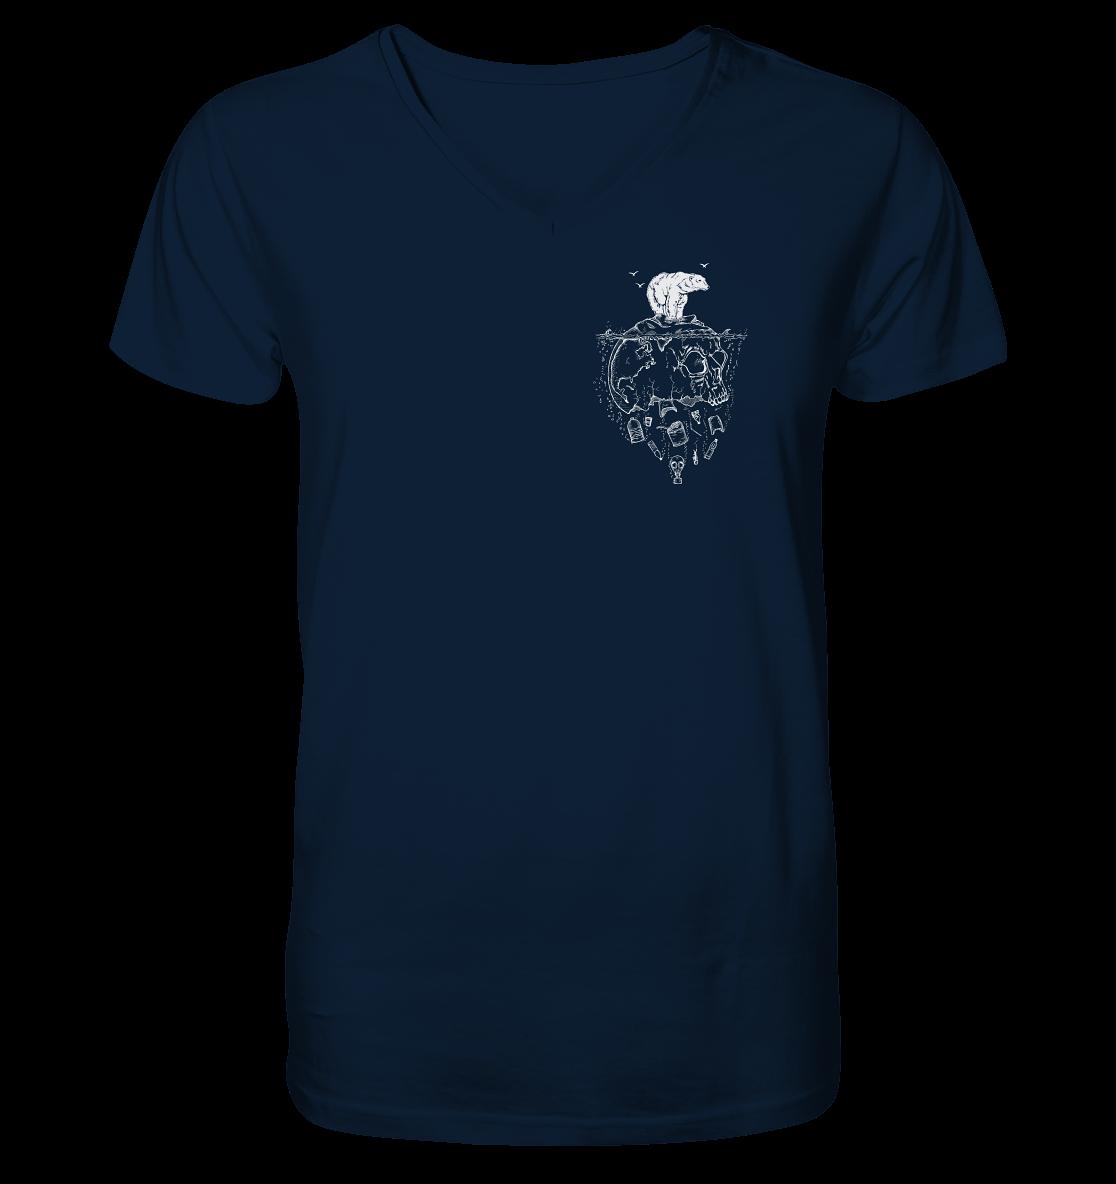 front-mens-organic-v-neck-shirt-0e2035-1116x-19.png